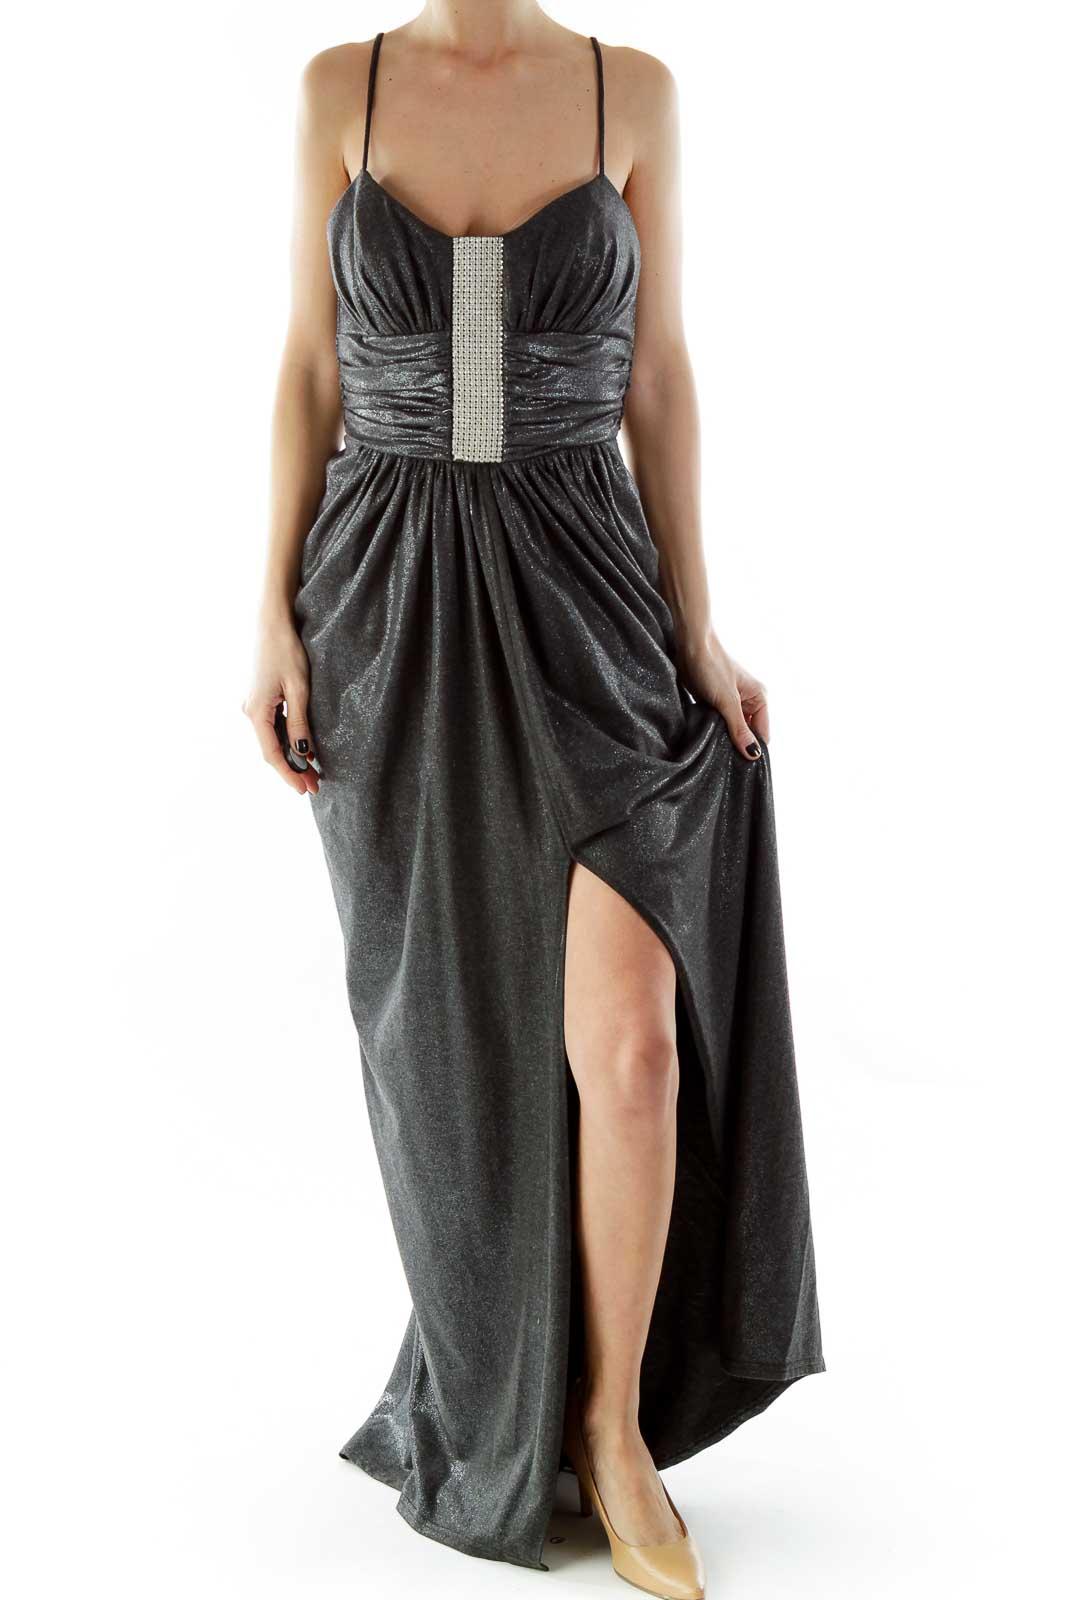 Gray Spaghetti Strap Metallic Evening Dress with Rhinestones Front